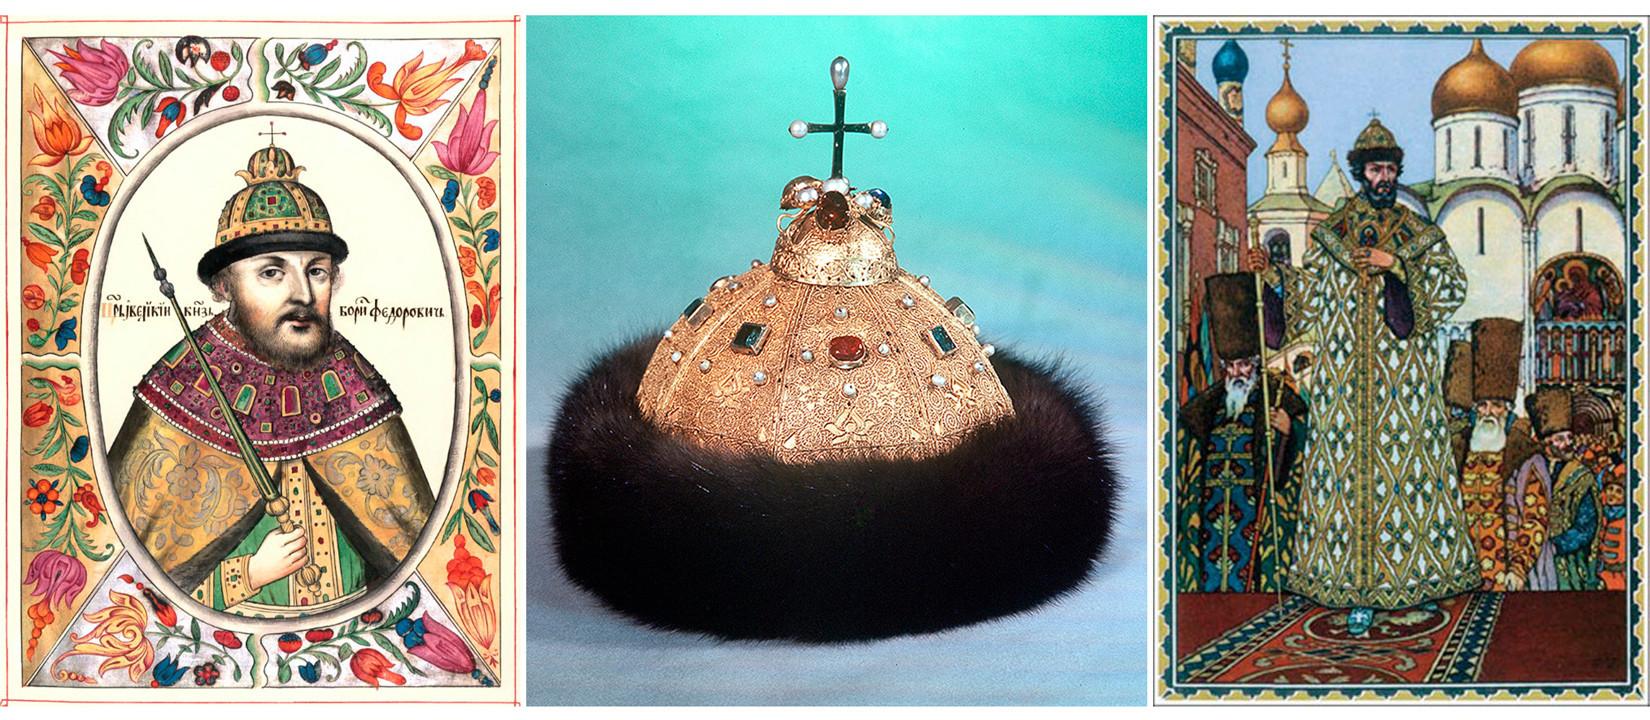 Boris Godunov  mengenakan Topi Monomakh.